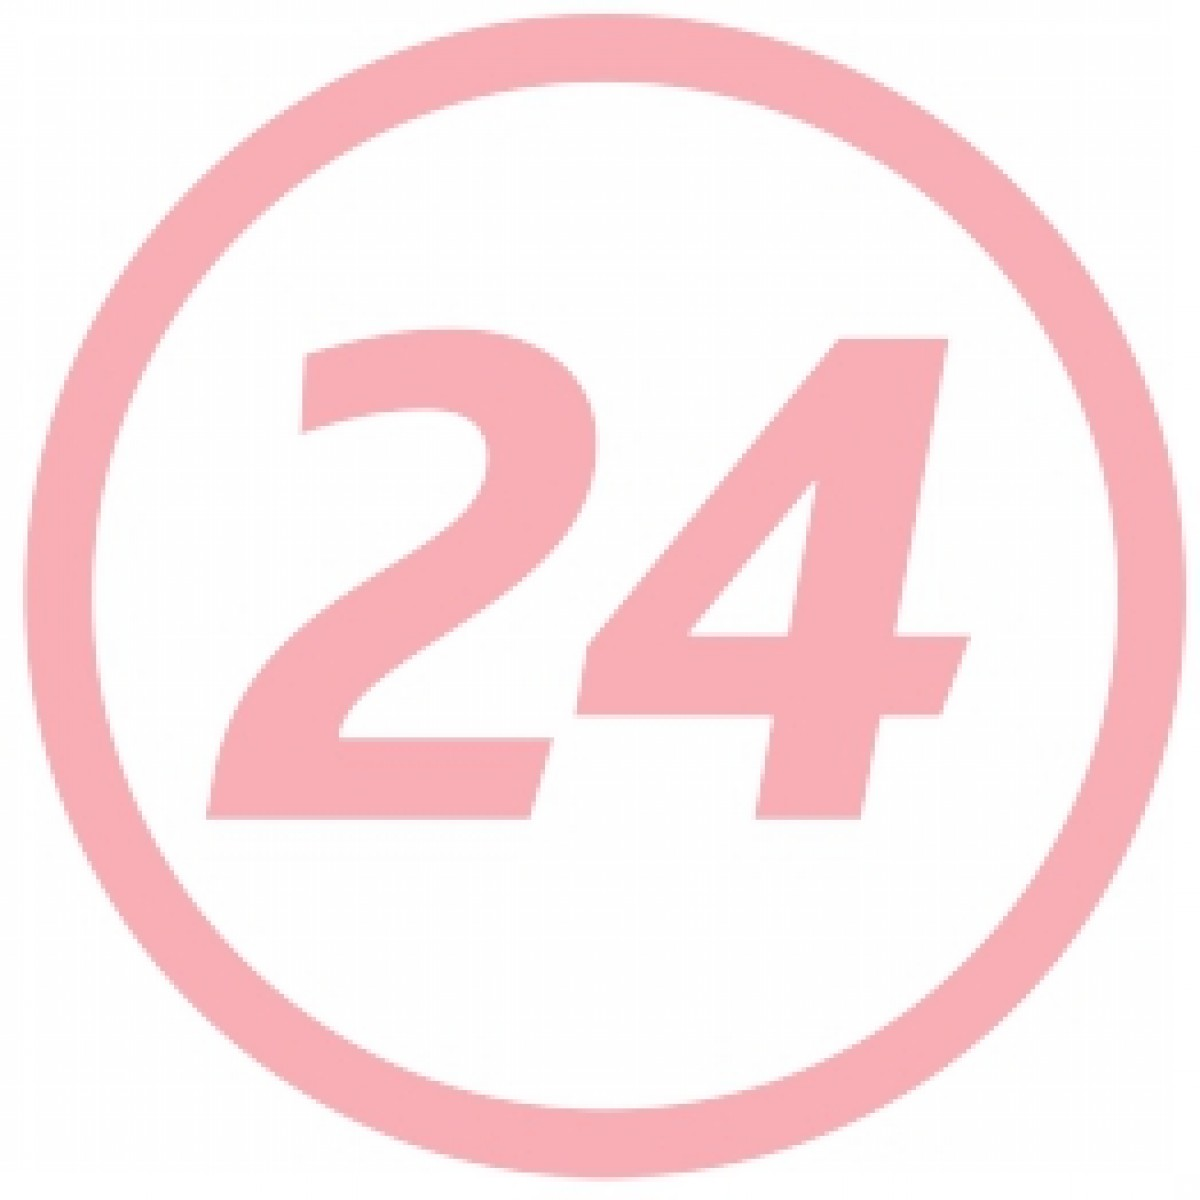 Ducray A-Derma Exomega Balsam Emolient, Balsam, 200ml